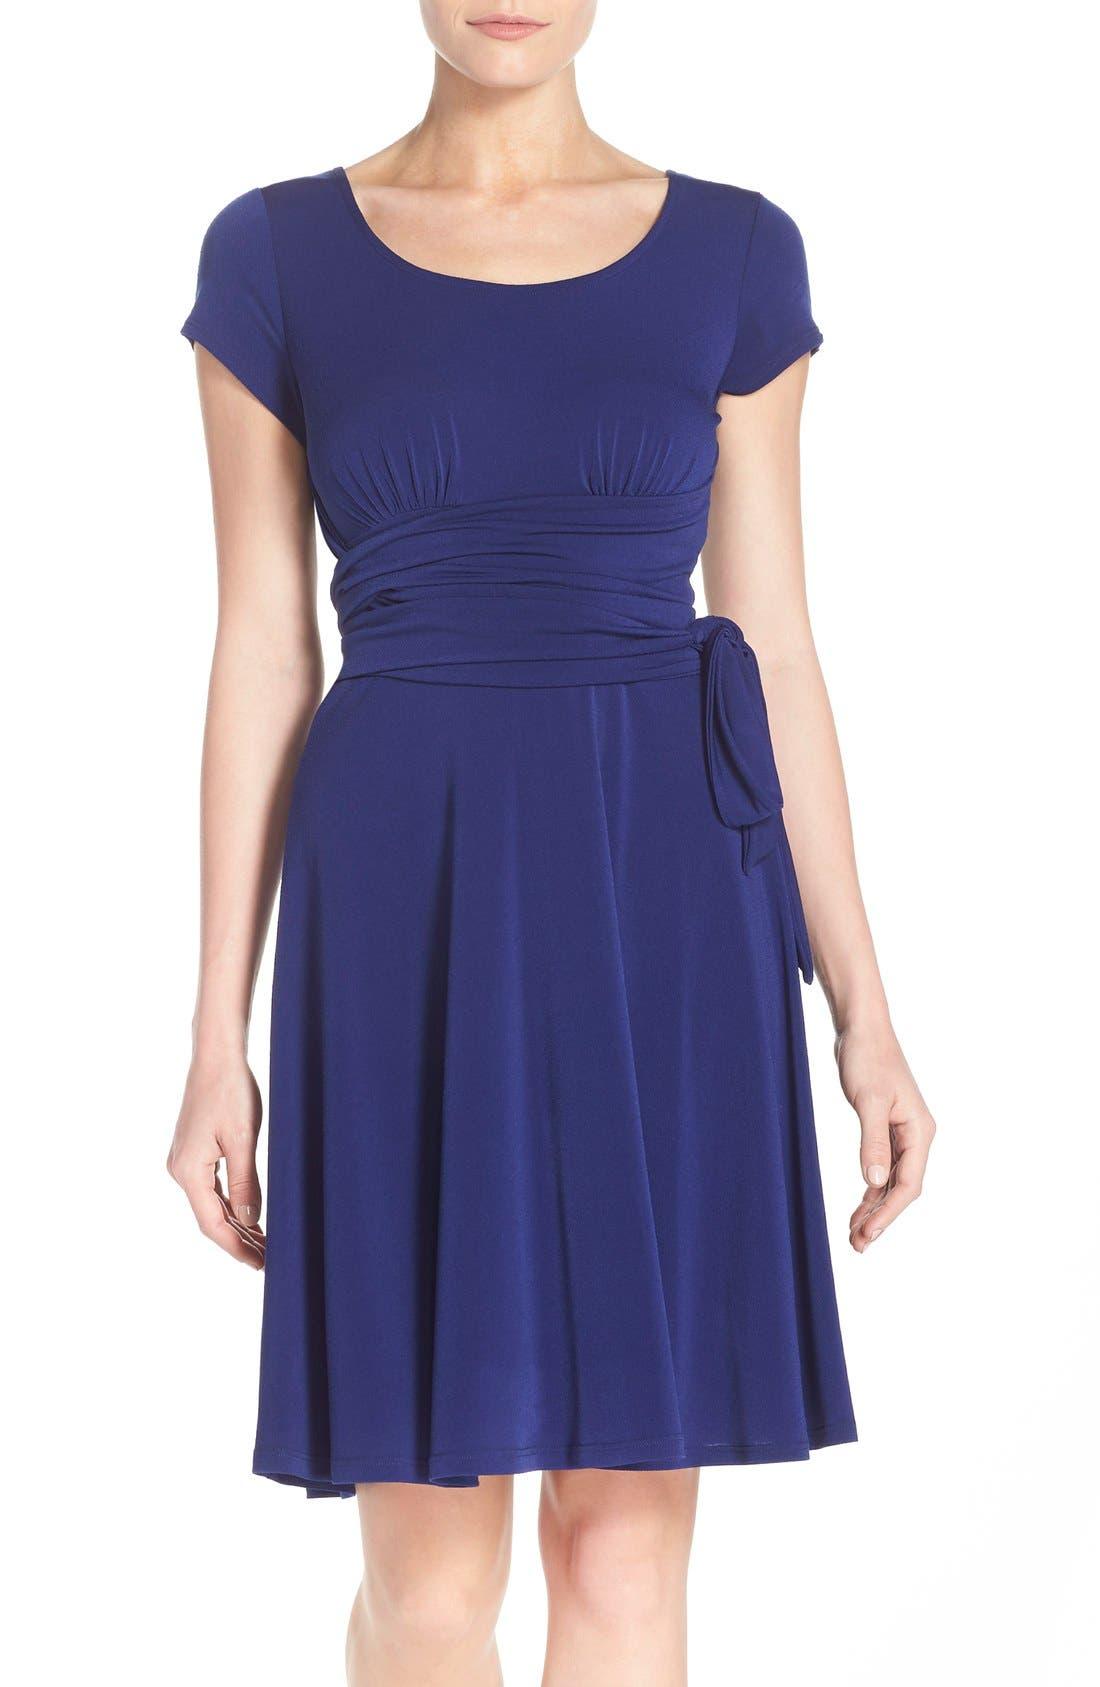 Leota Scoop Neck Jersey Fit & Flare Dress